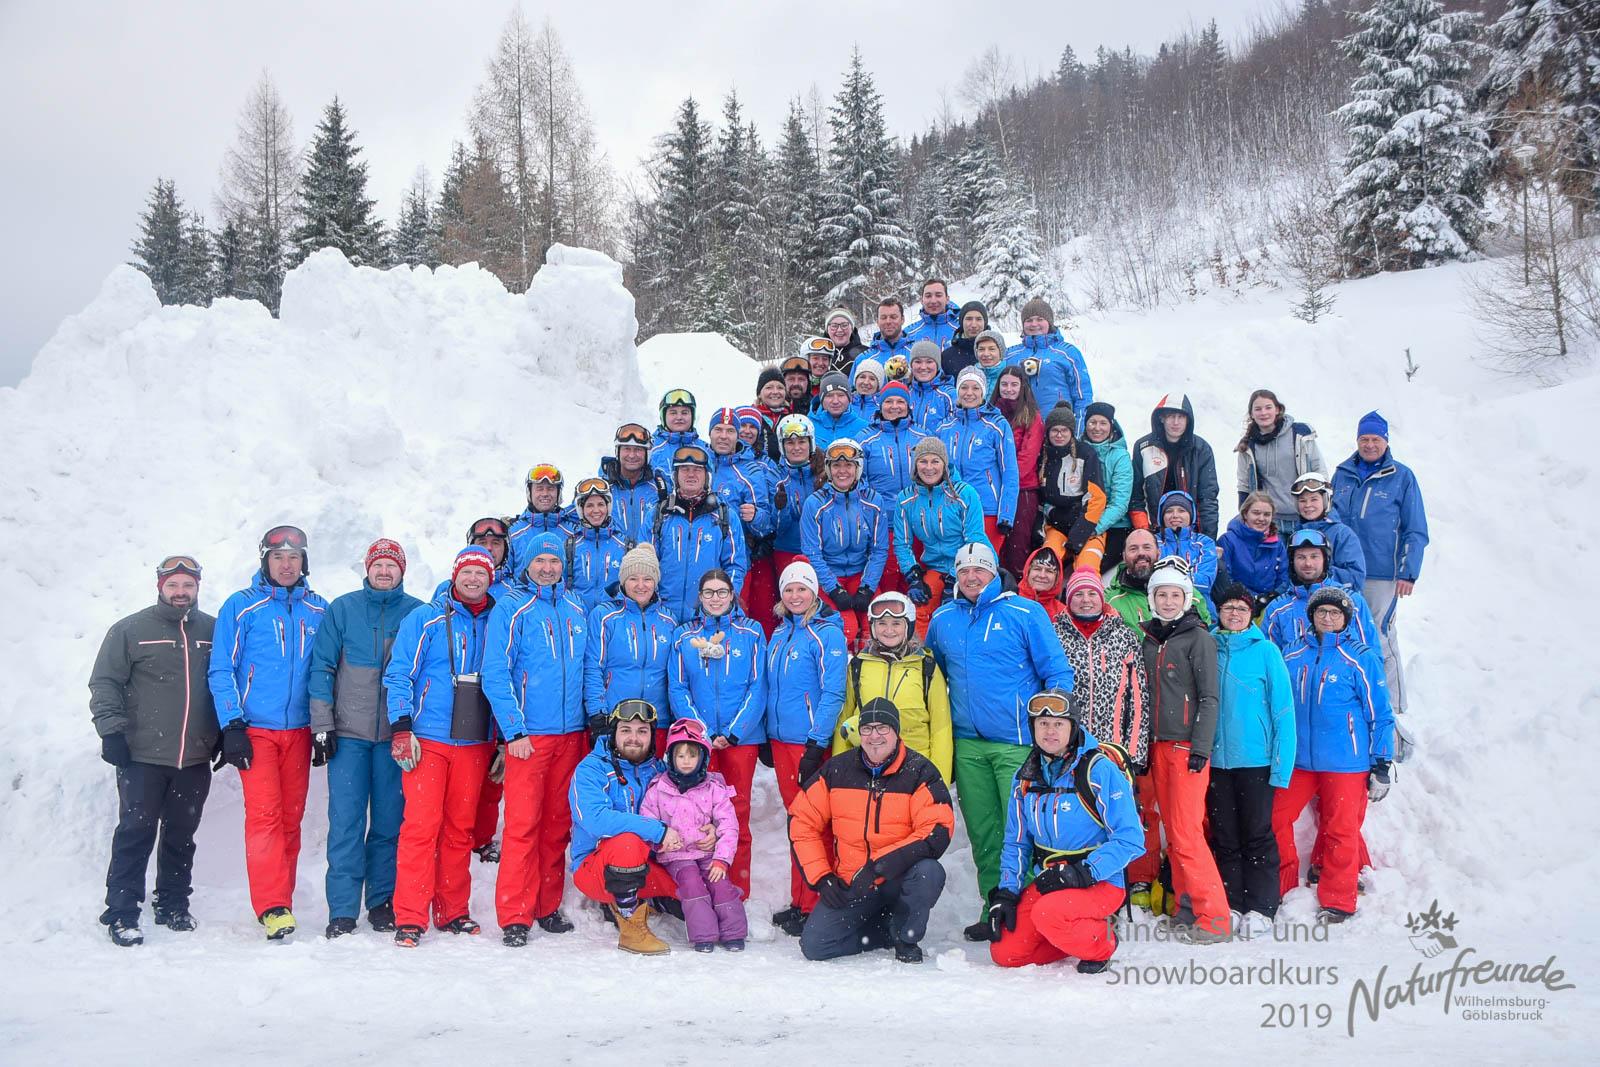 Kinderschi u. Snowboardkurs 2019 Rückblick